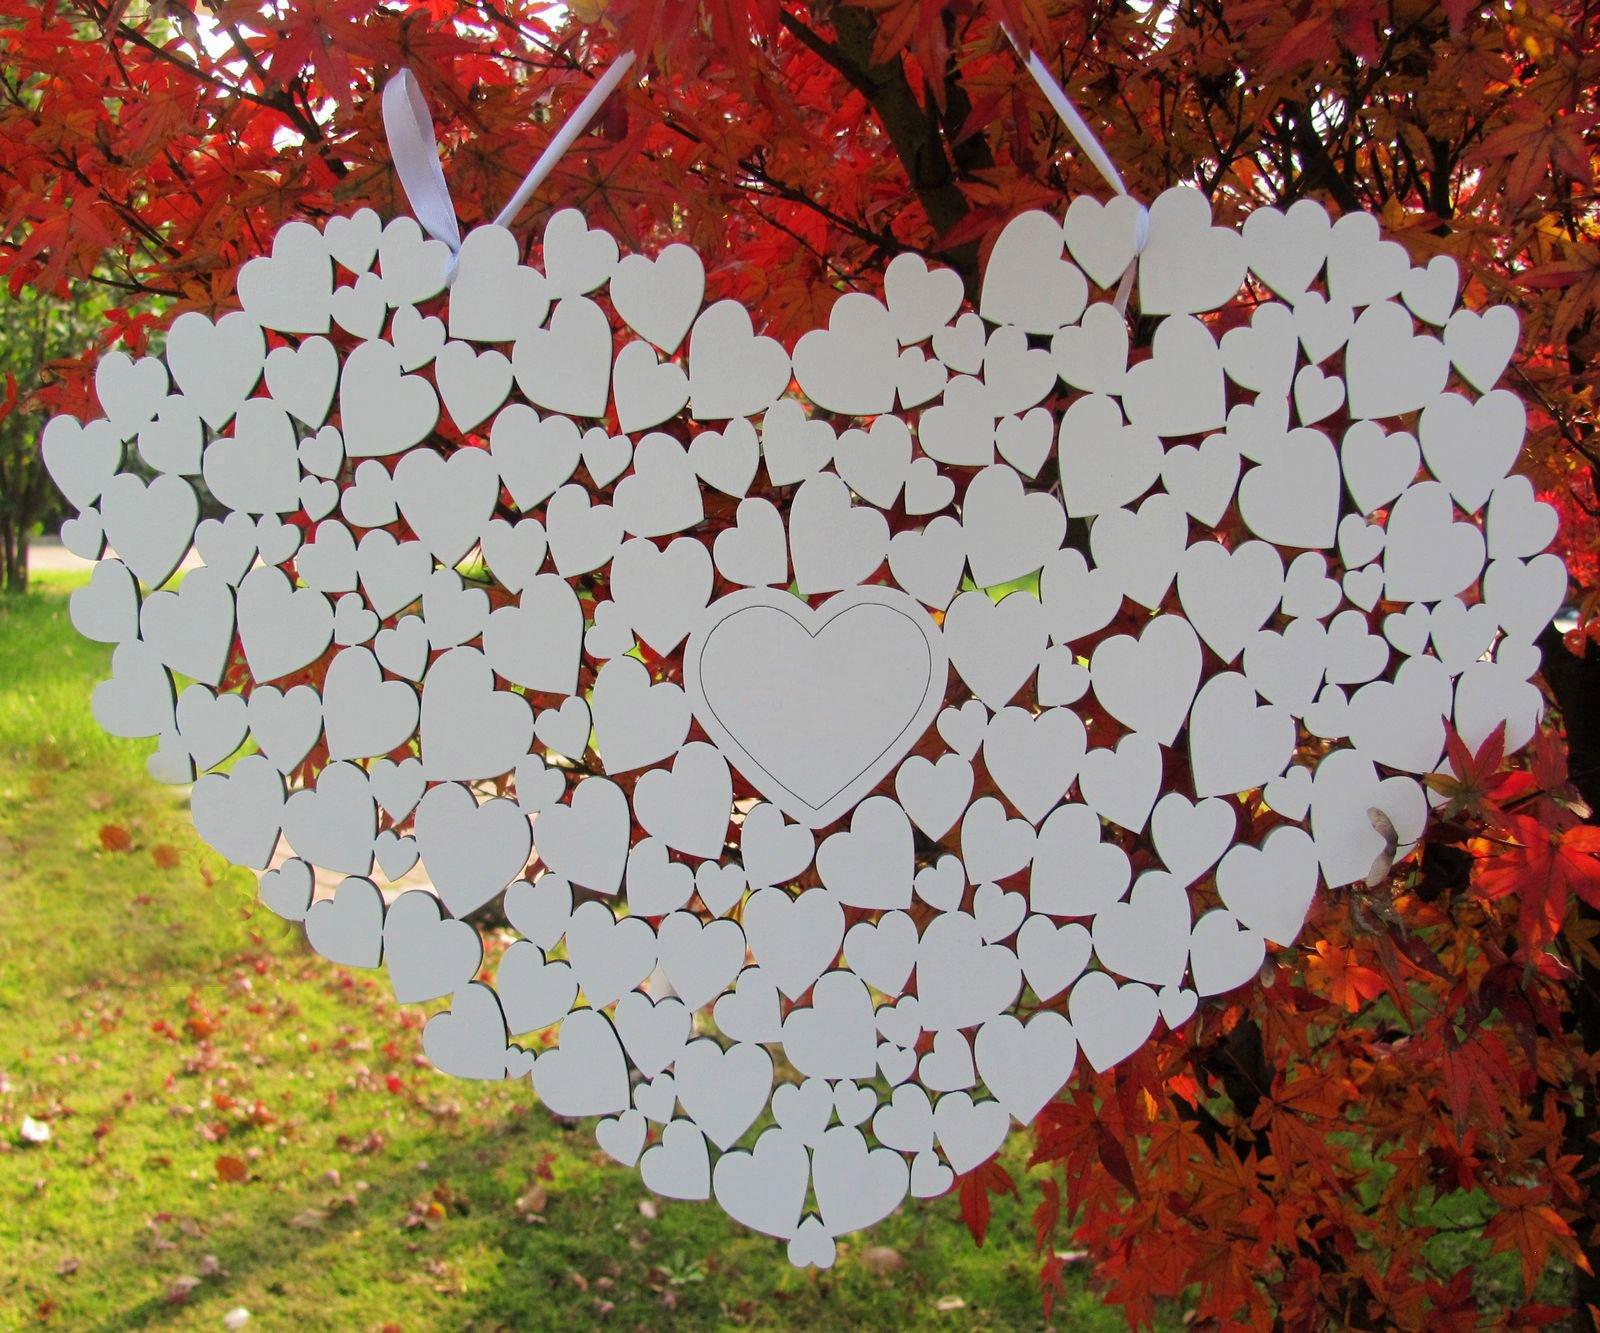 SL Crafts Wooden Heart Wedding guestbook Hanging Heart Guest Book Alternative (White)